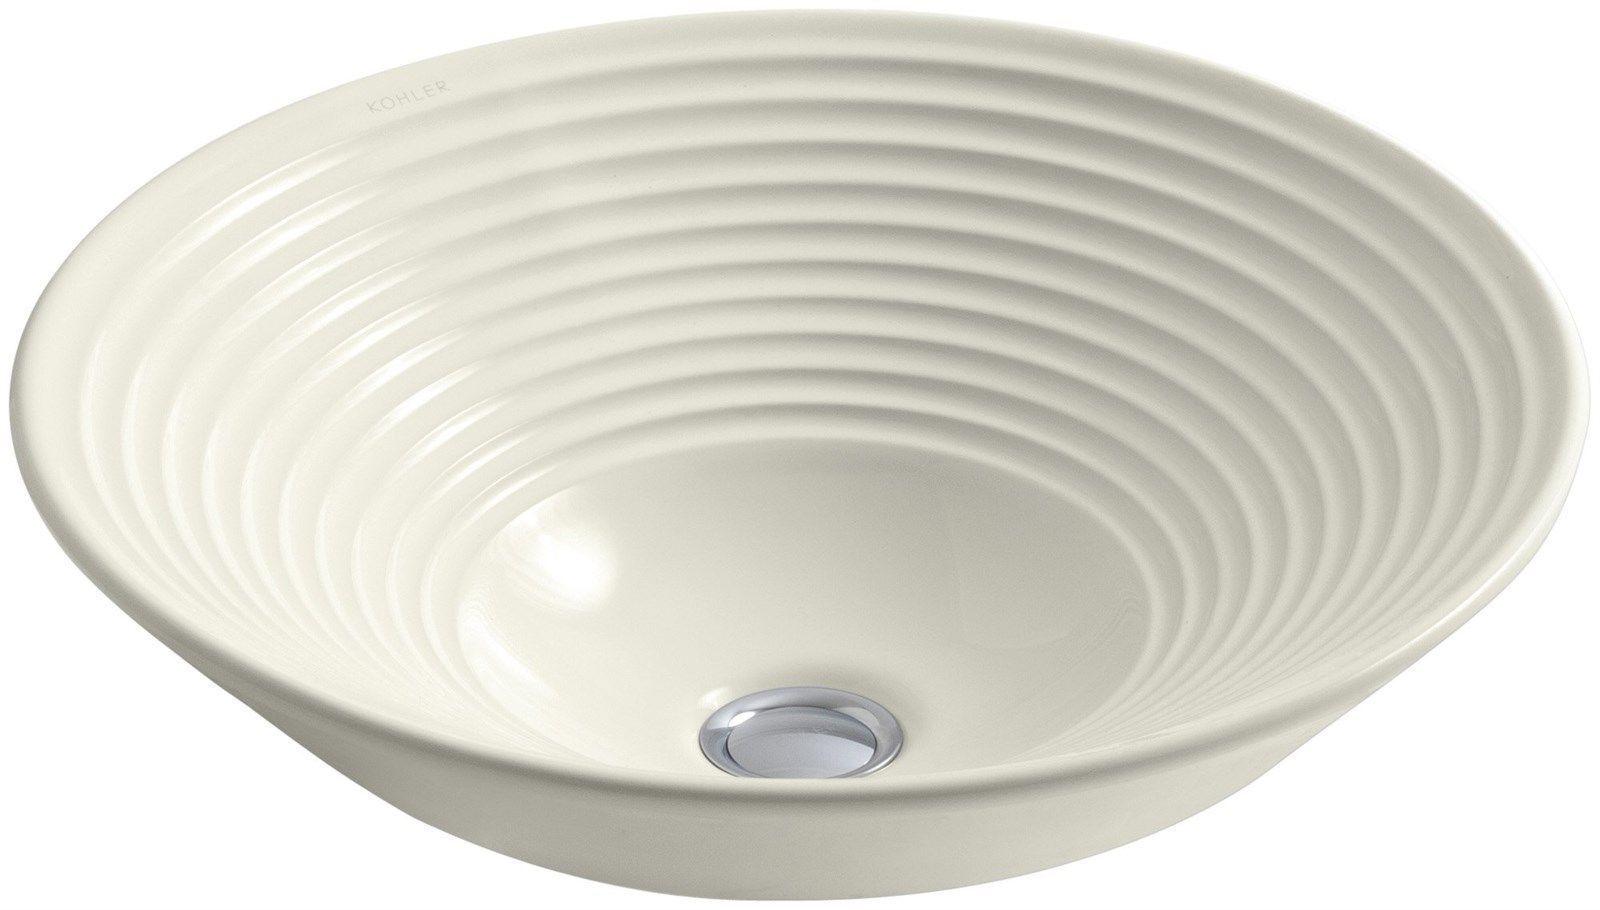 Kohler Vessel Sinks : Kohler K-2191-96 Turnings Vessels Bathroom Sink Above Counter Biscuit ...